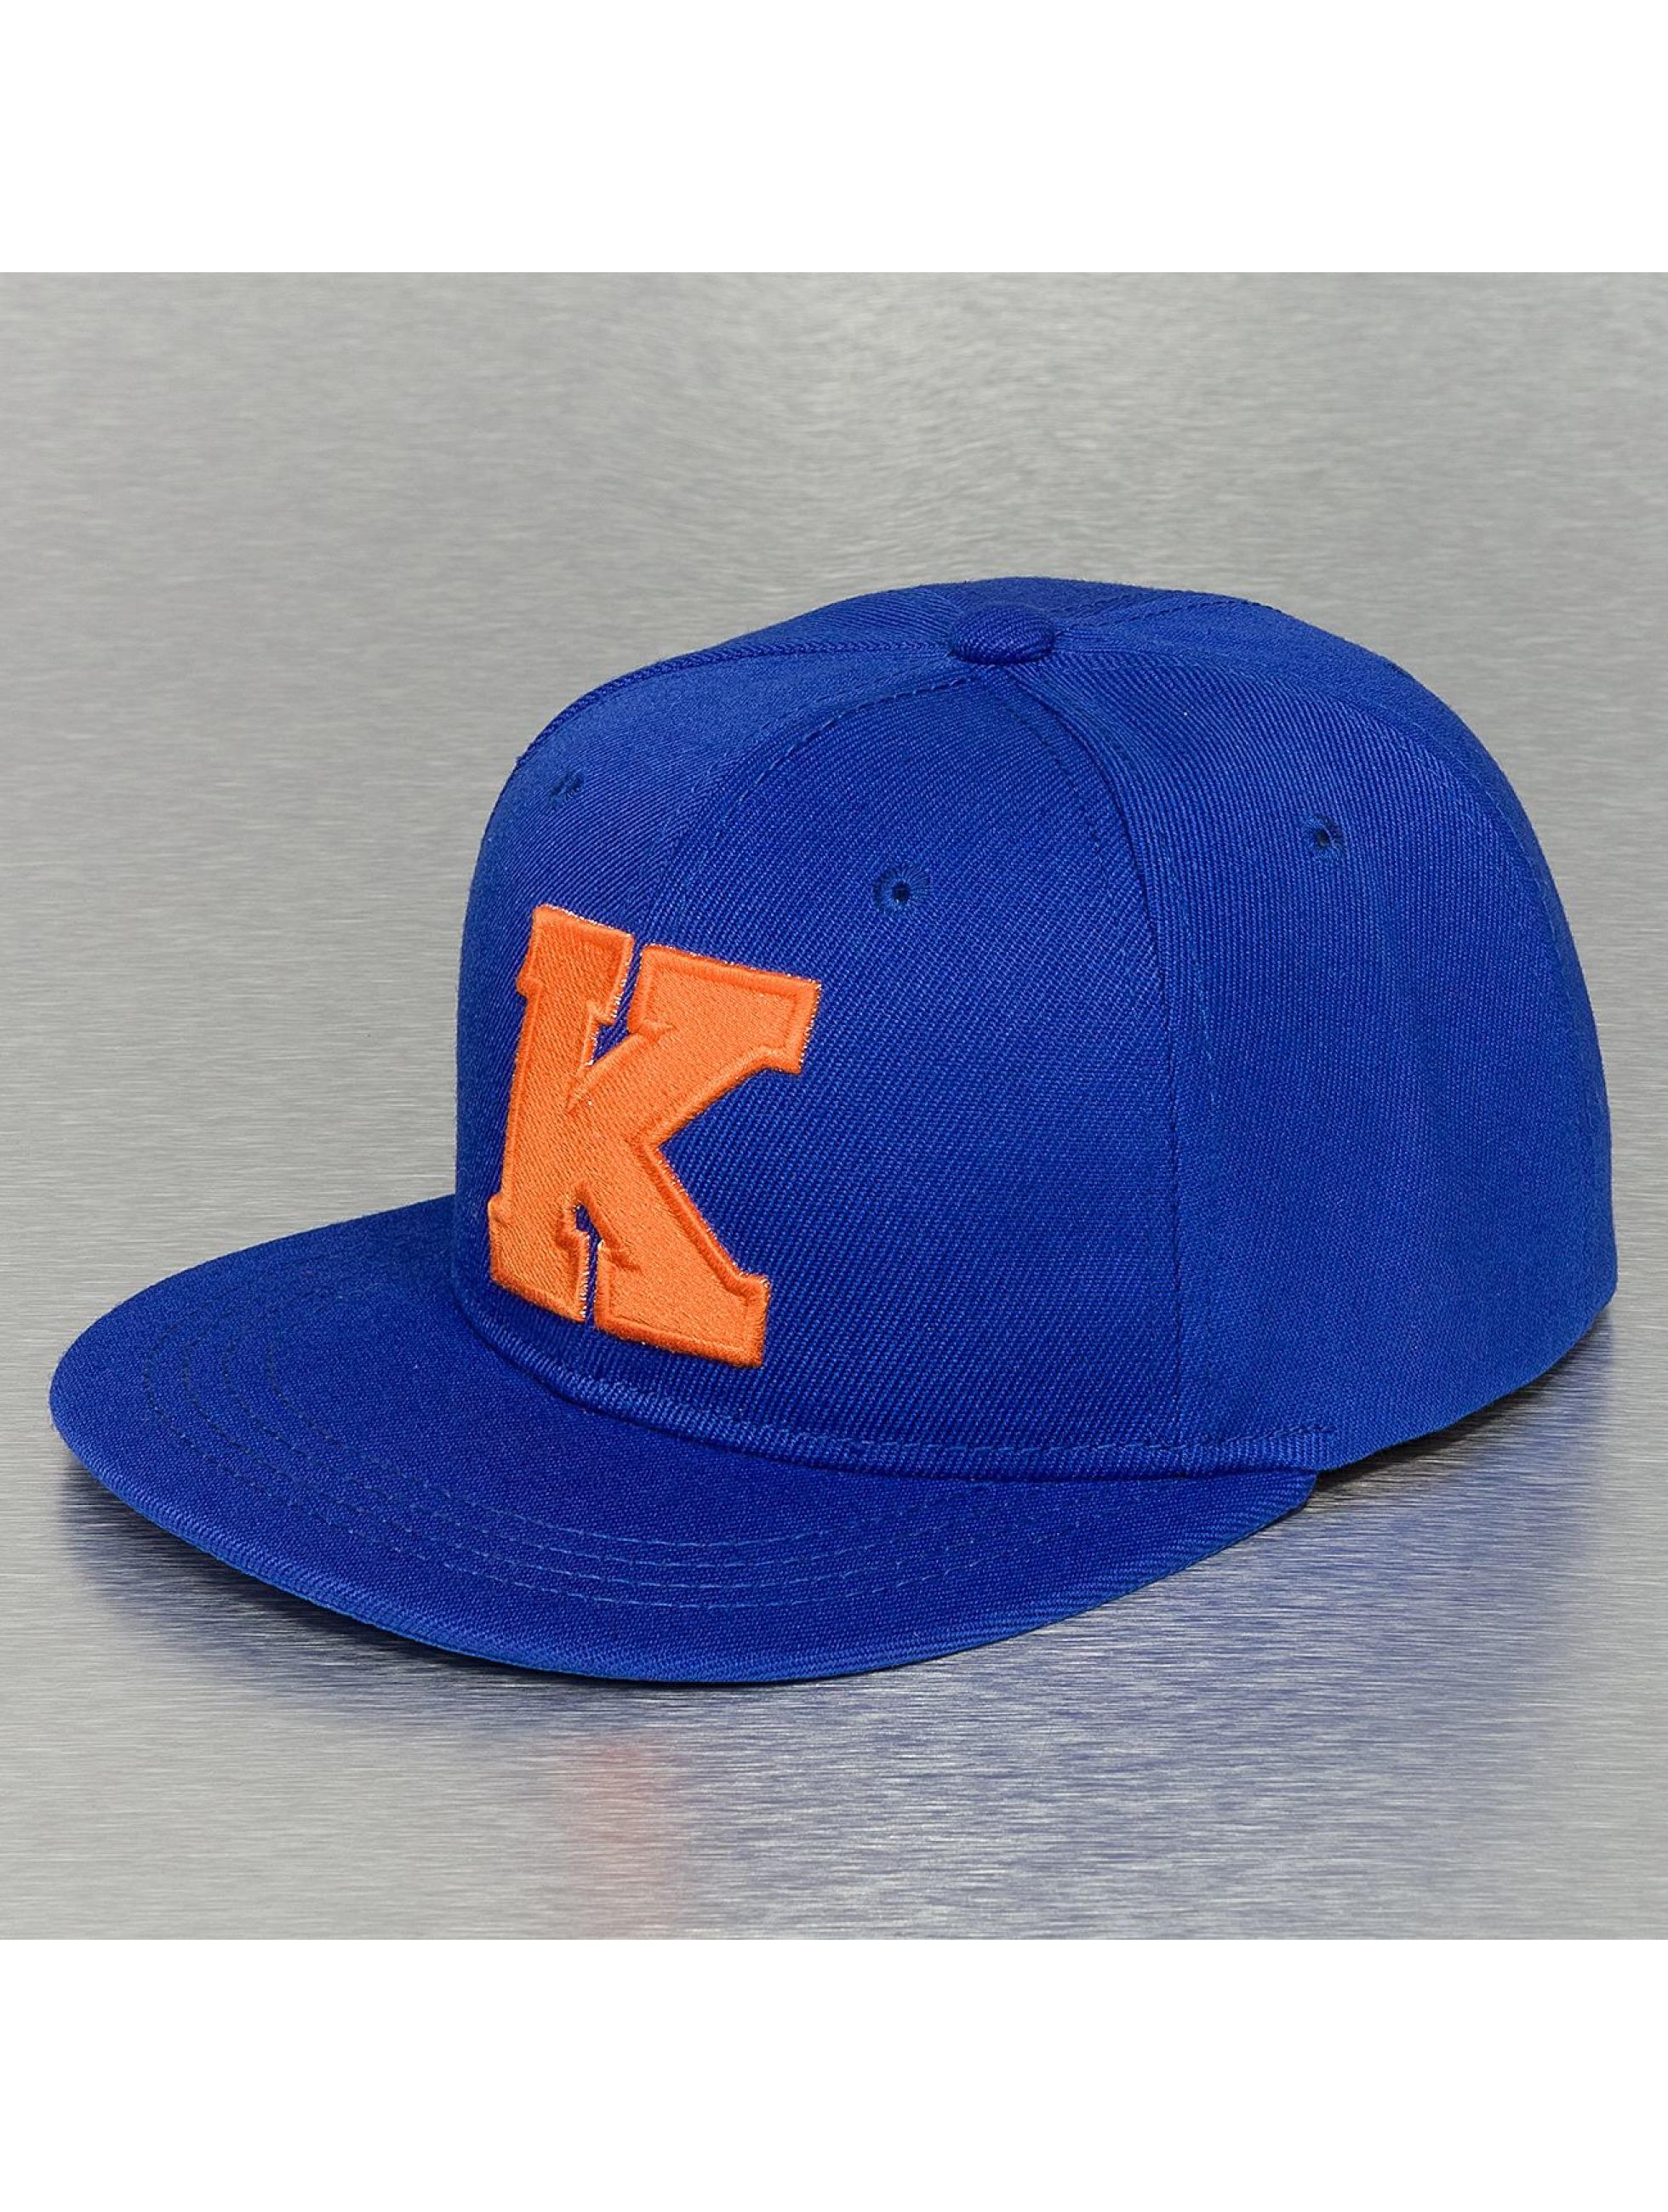 TrueSpin snapback cap K-ABC Edition blauw